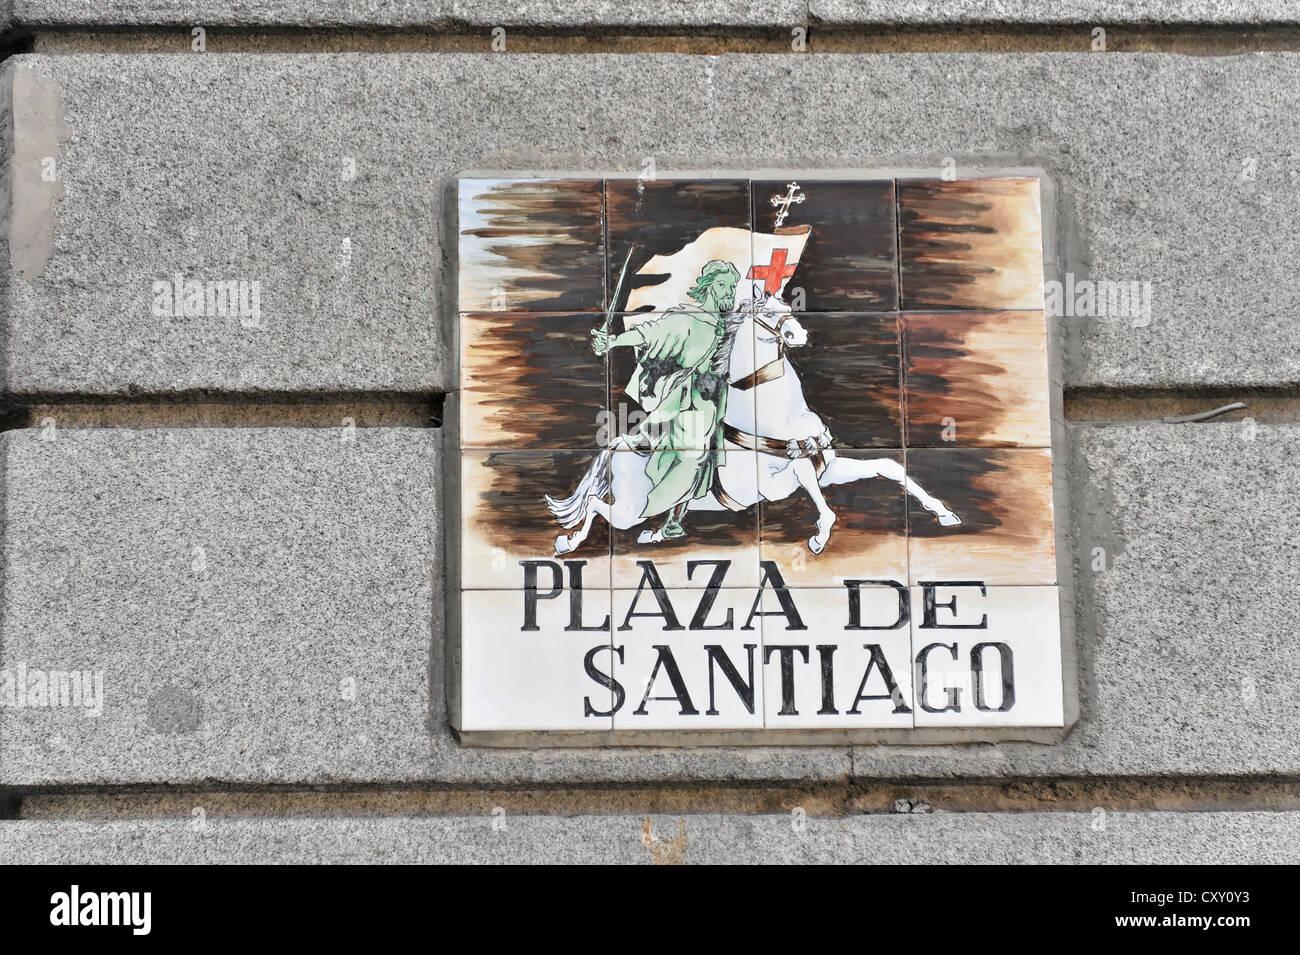 Sign for santiago immagini & sign for santiago fotos stock alamy